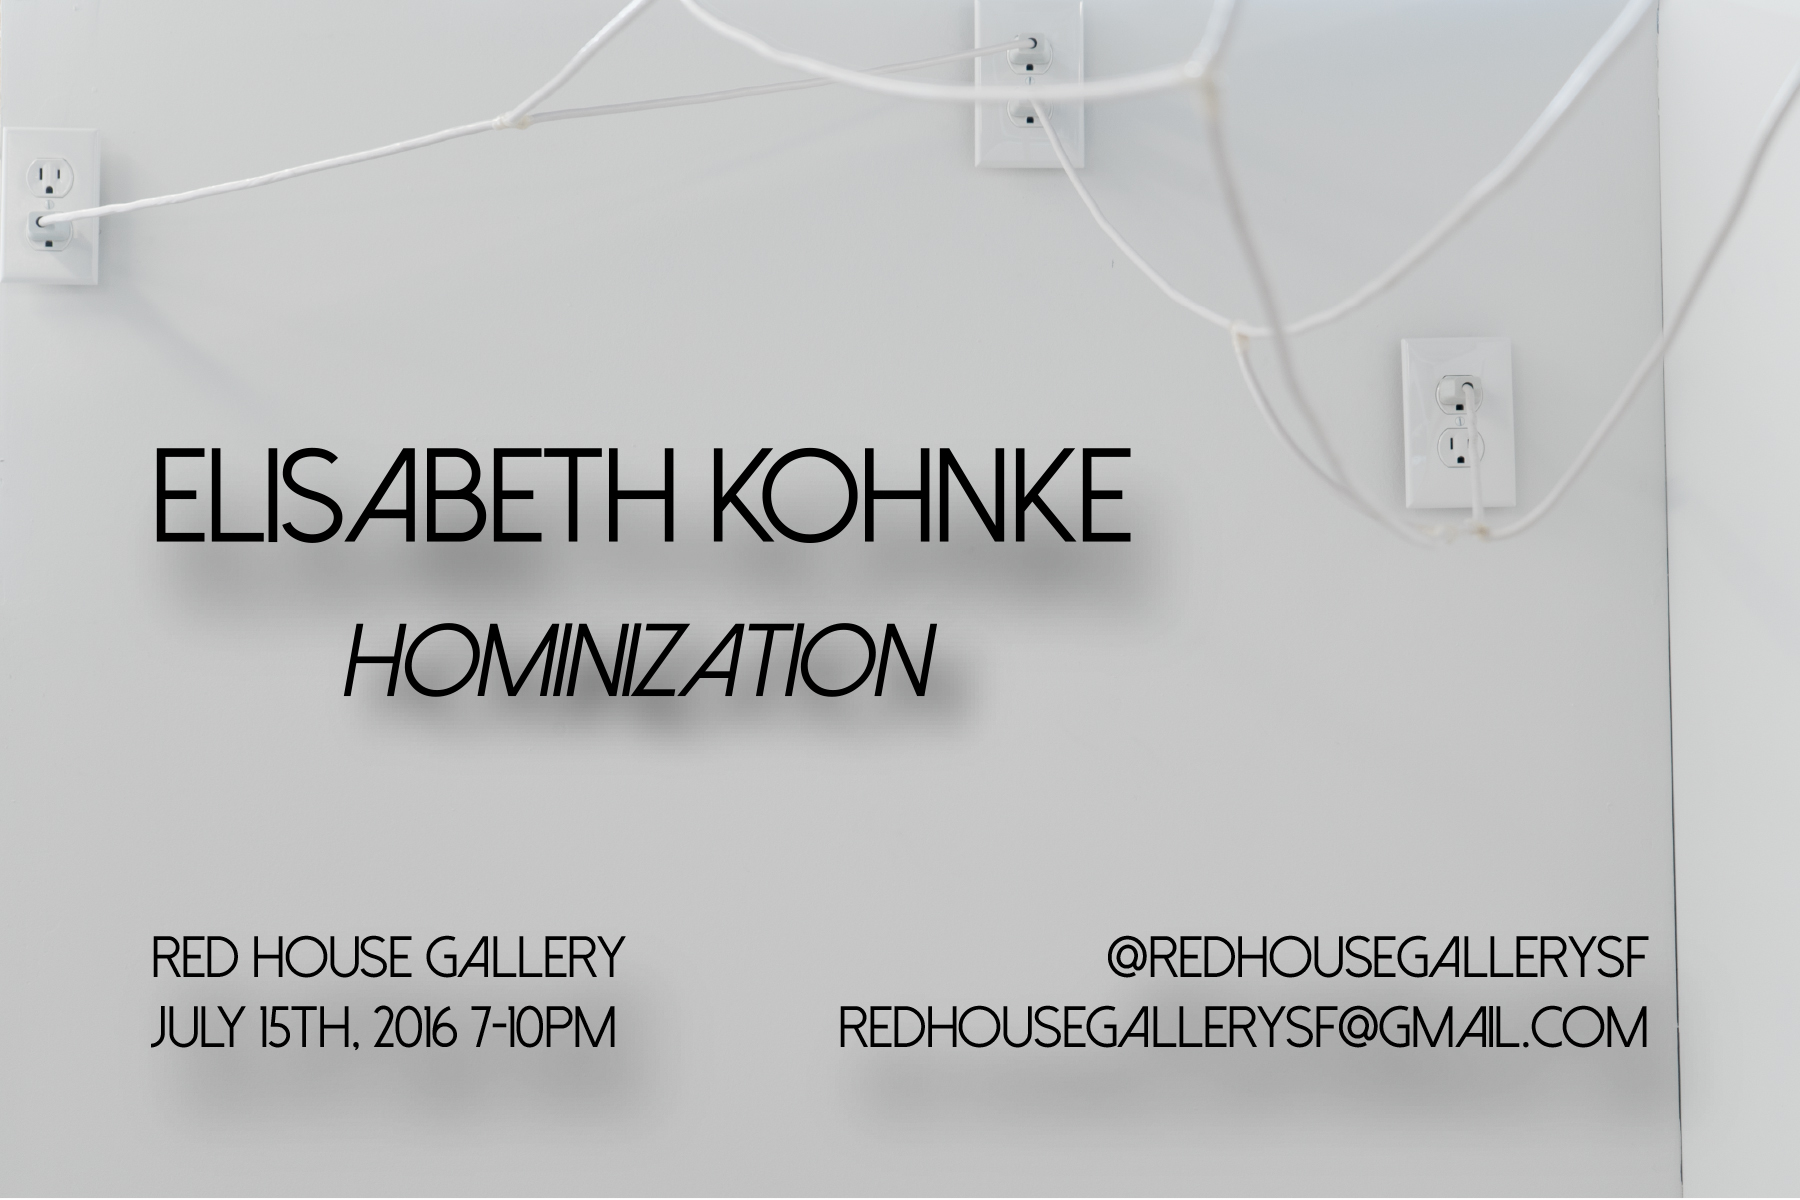 Kohnke_Elisabeth_Hominization.jpg